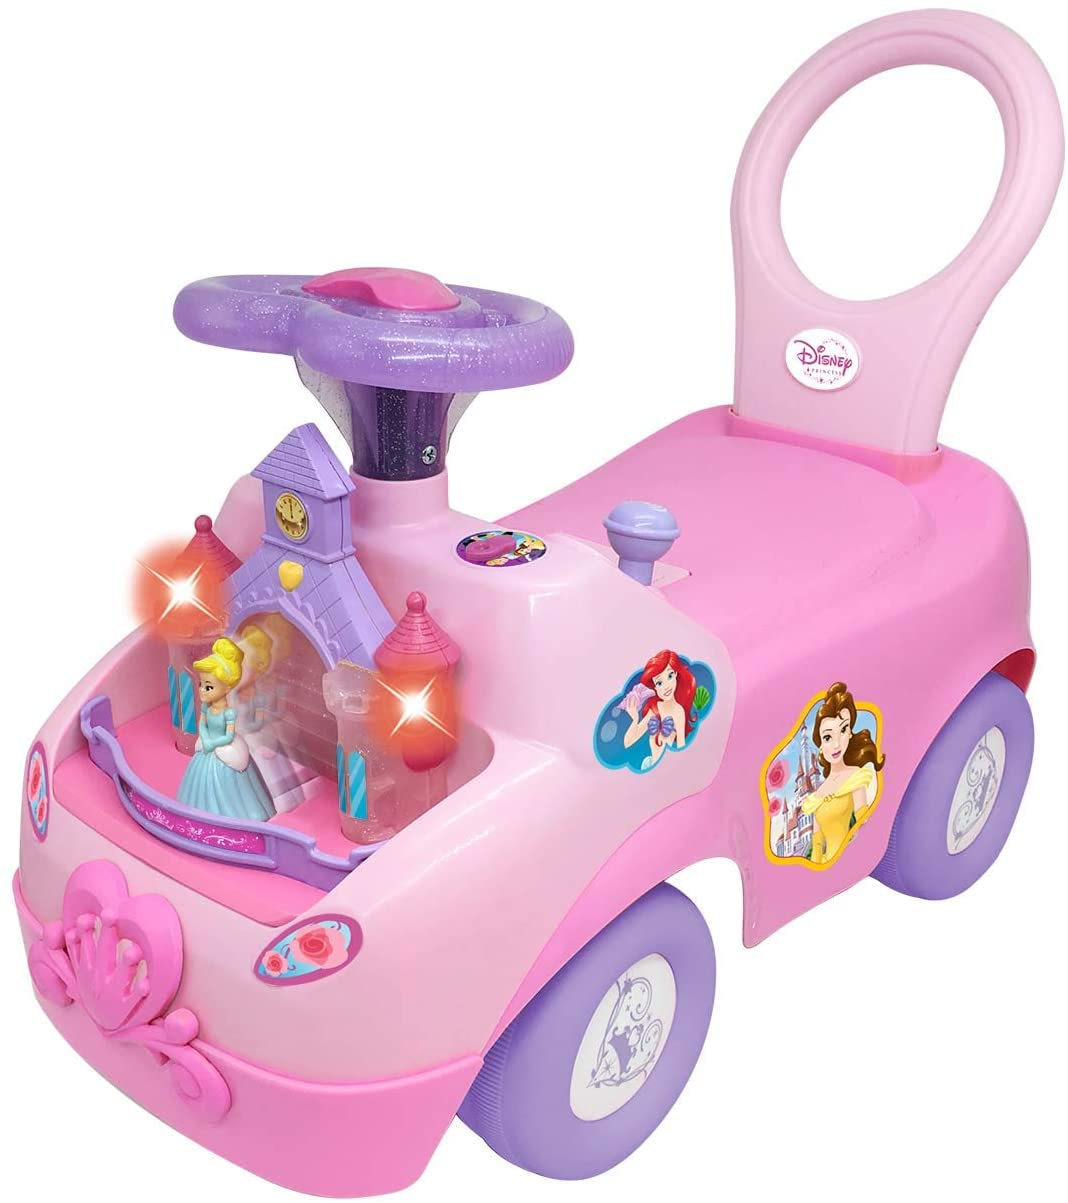 Kiddieland Disney Magical Castle Deluxe Ride On